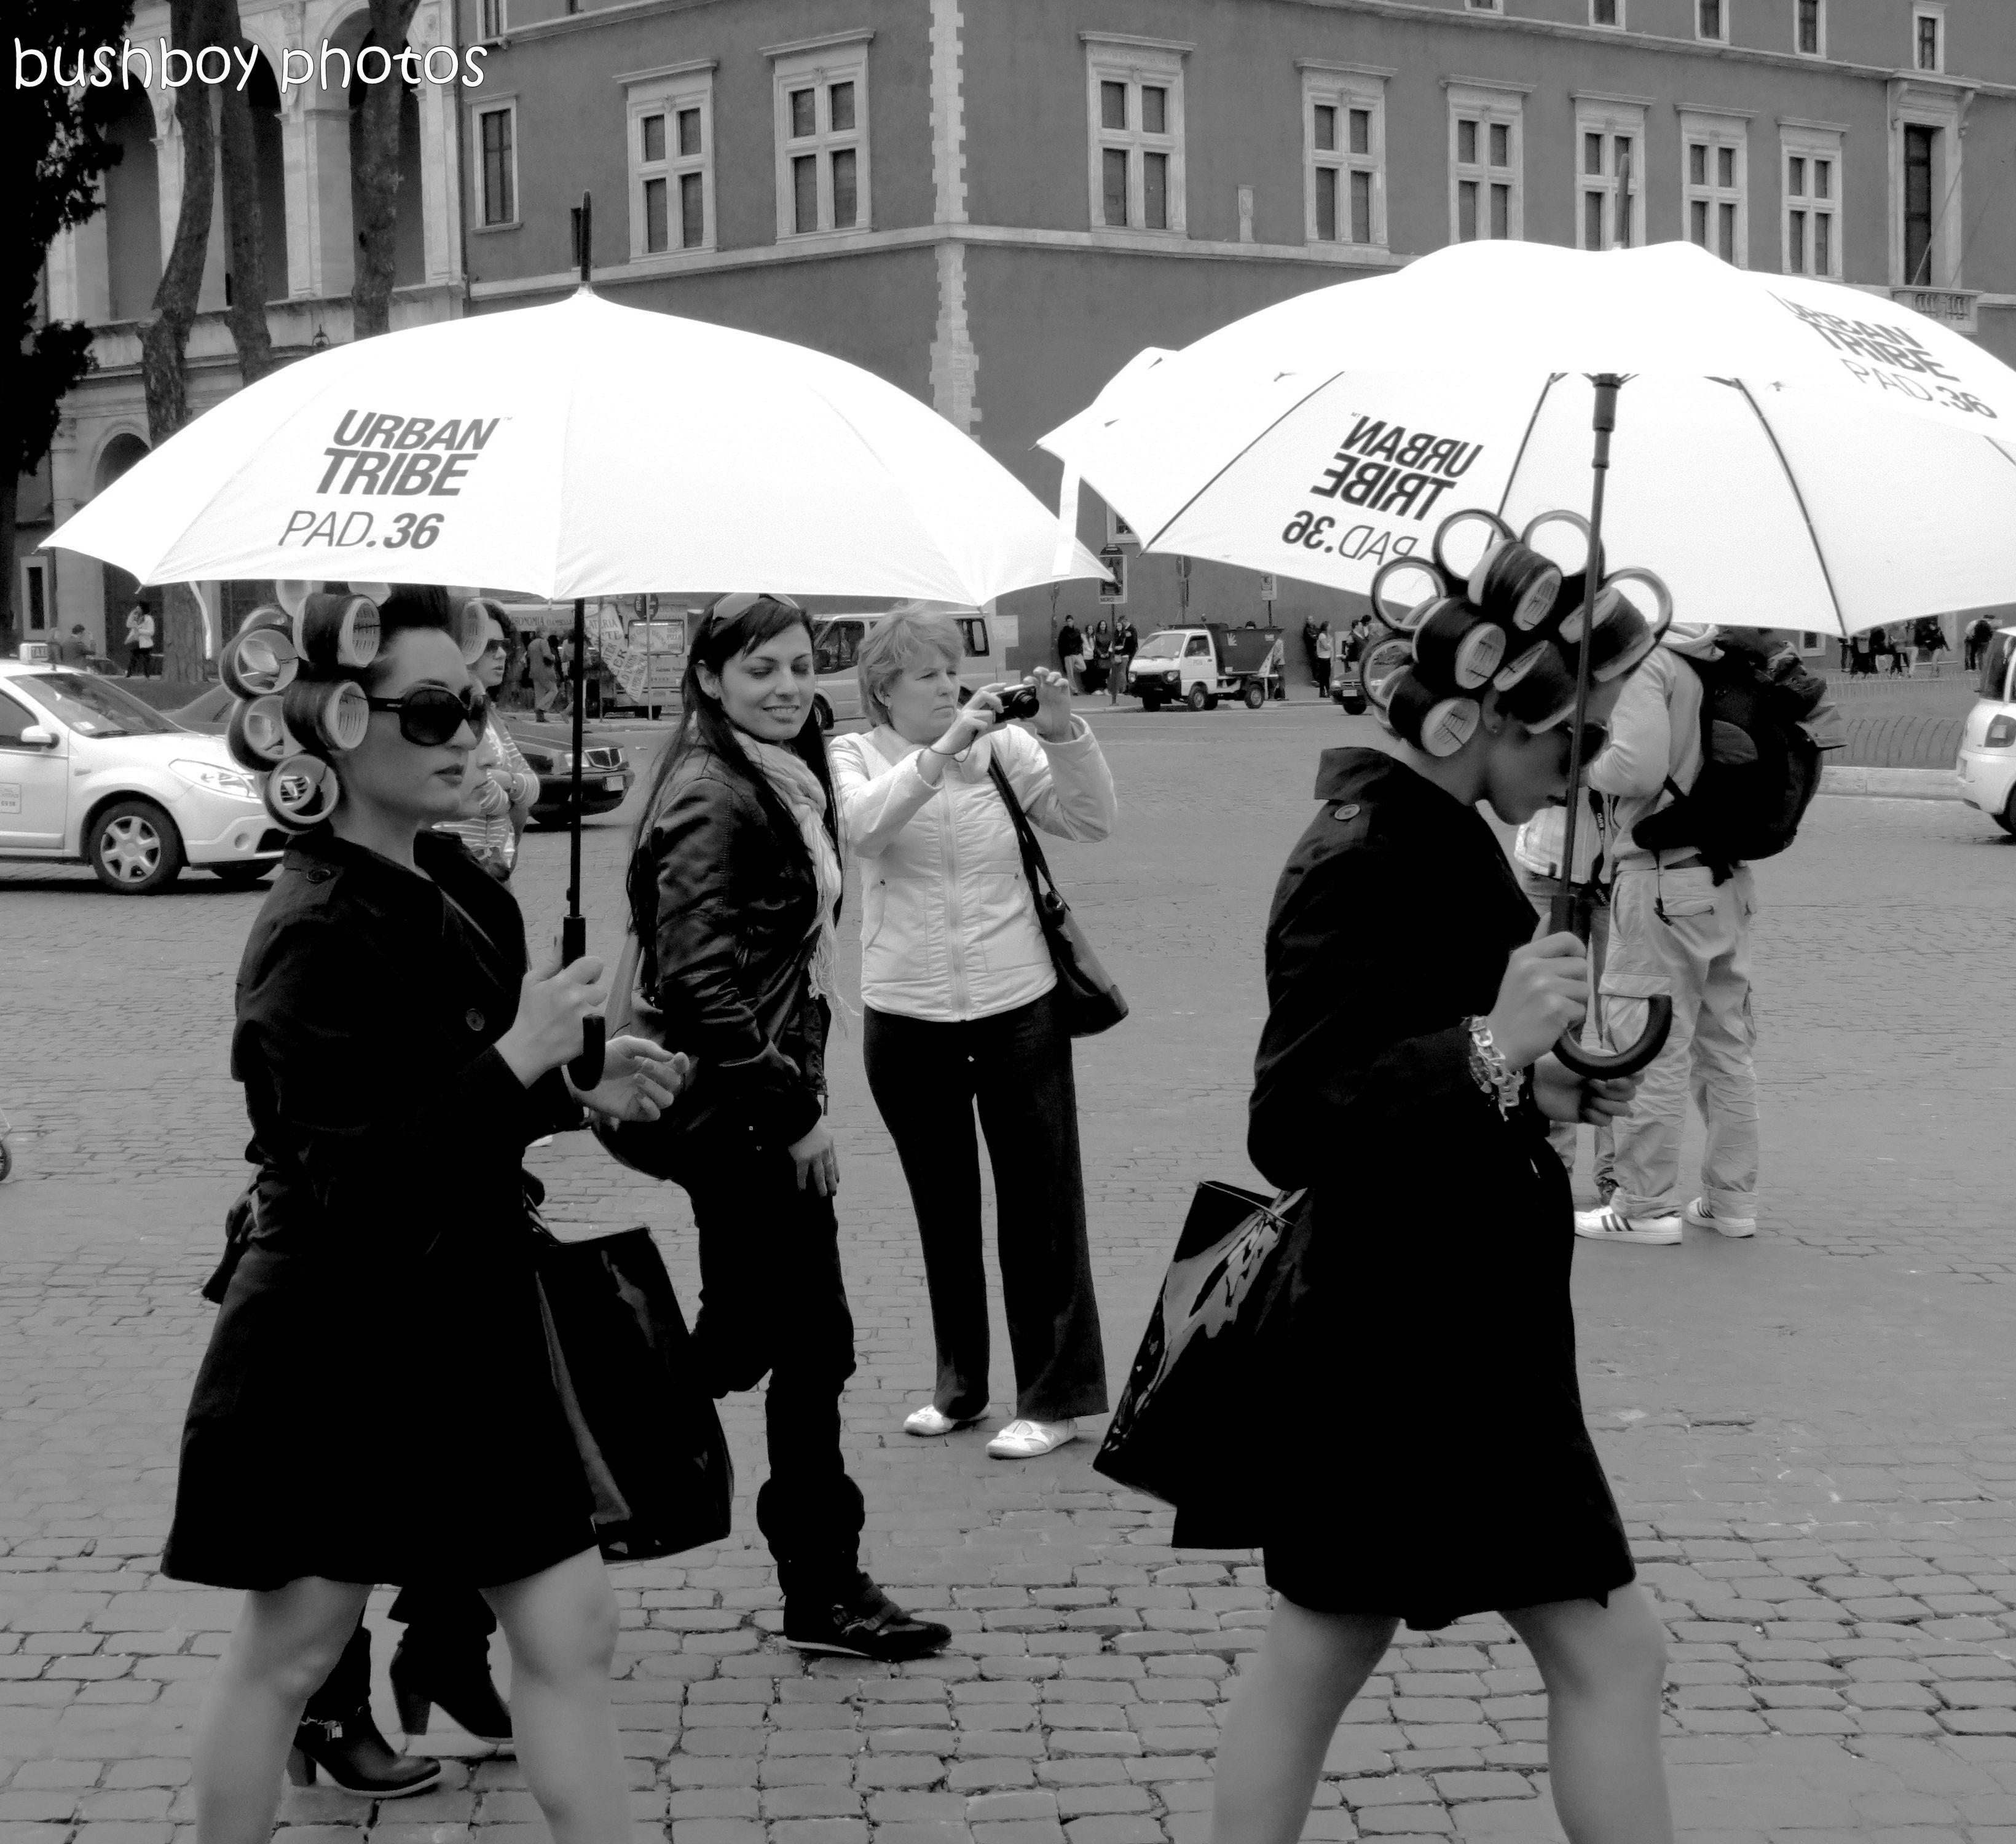 170512_bandw challenge_letter u_umbrella promo